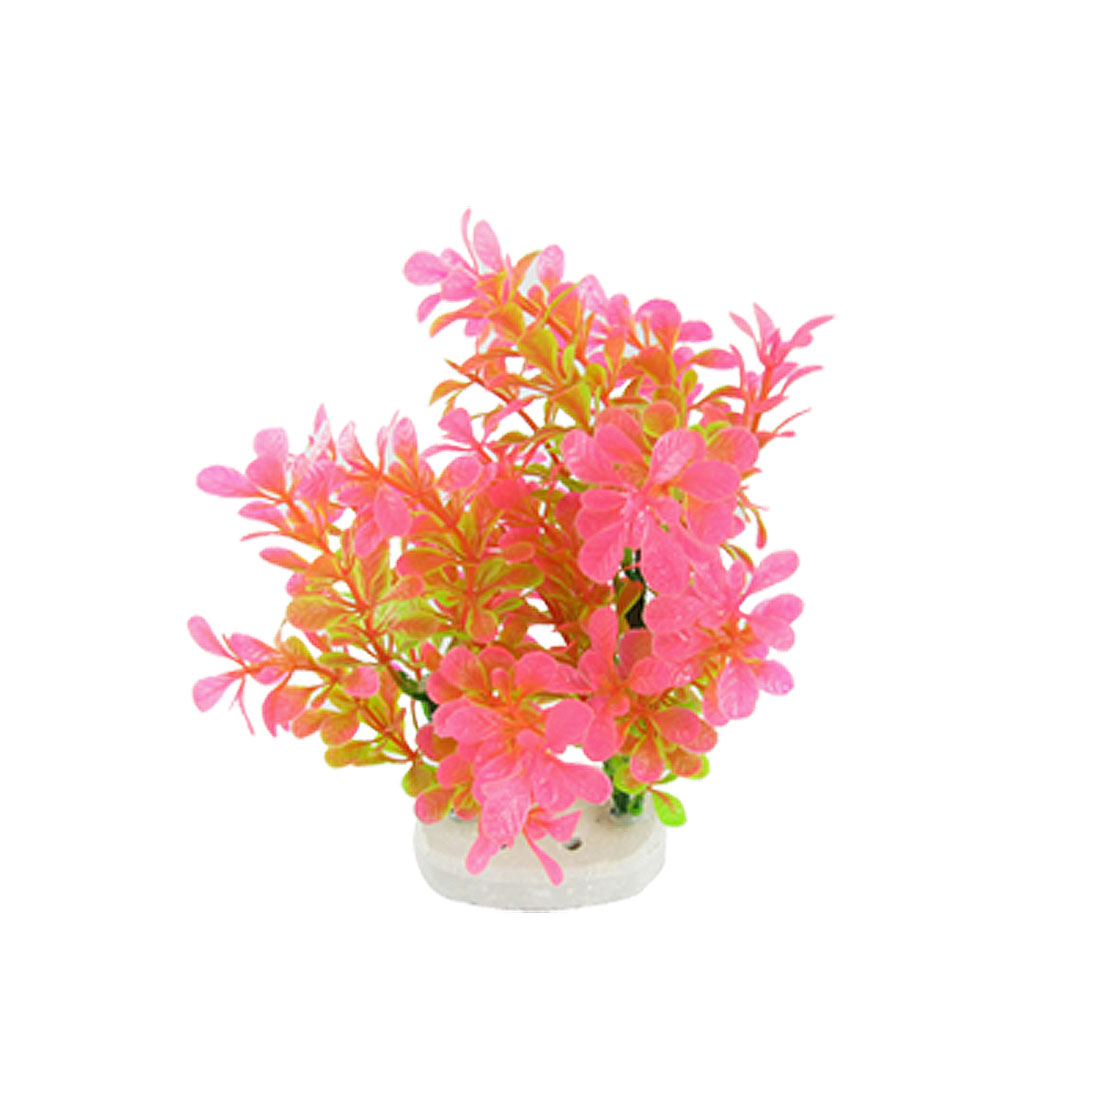 Aquarium Fish Tank Plastic Two-tone Lobelia Cardinalis Plants Decoration